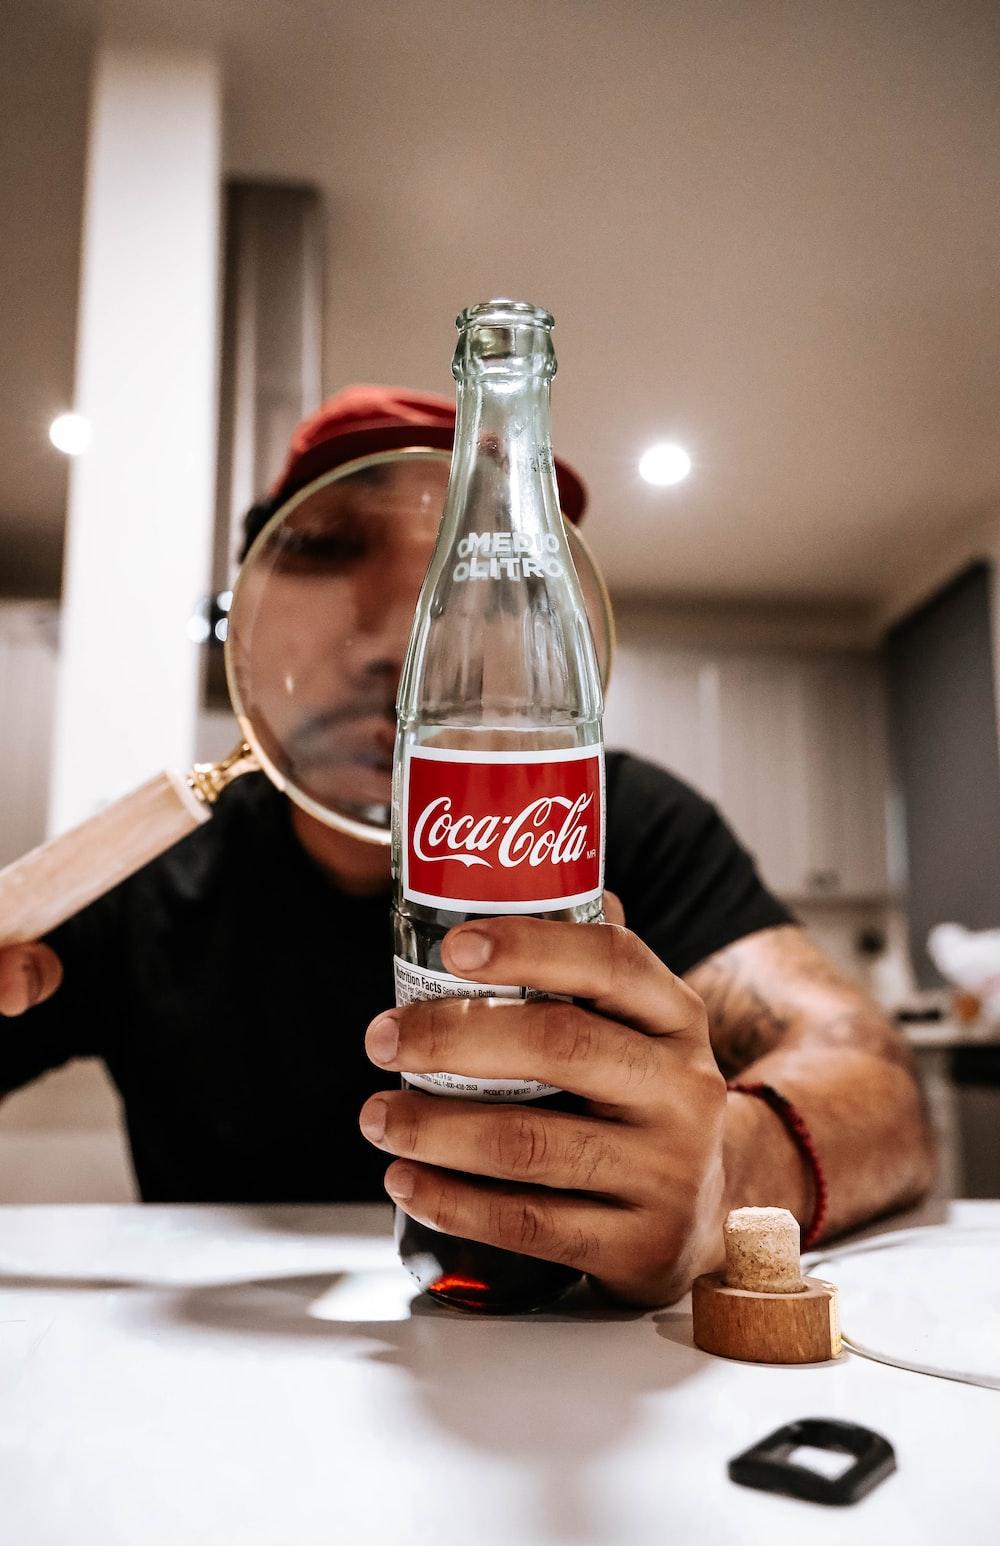 person holding coca cola glass bottle